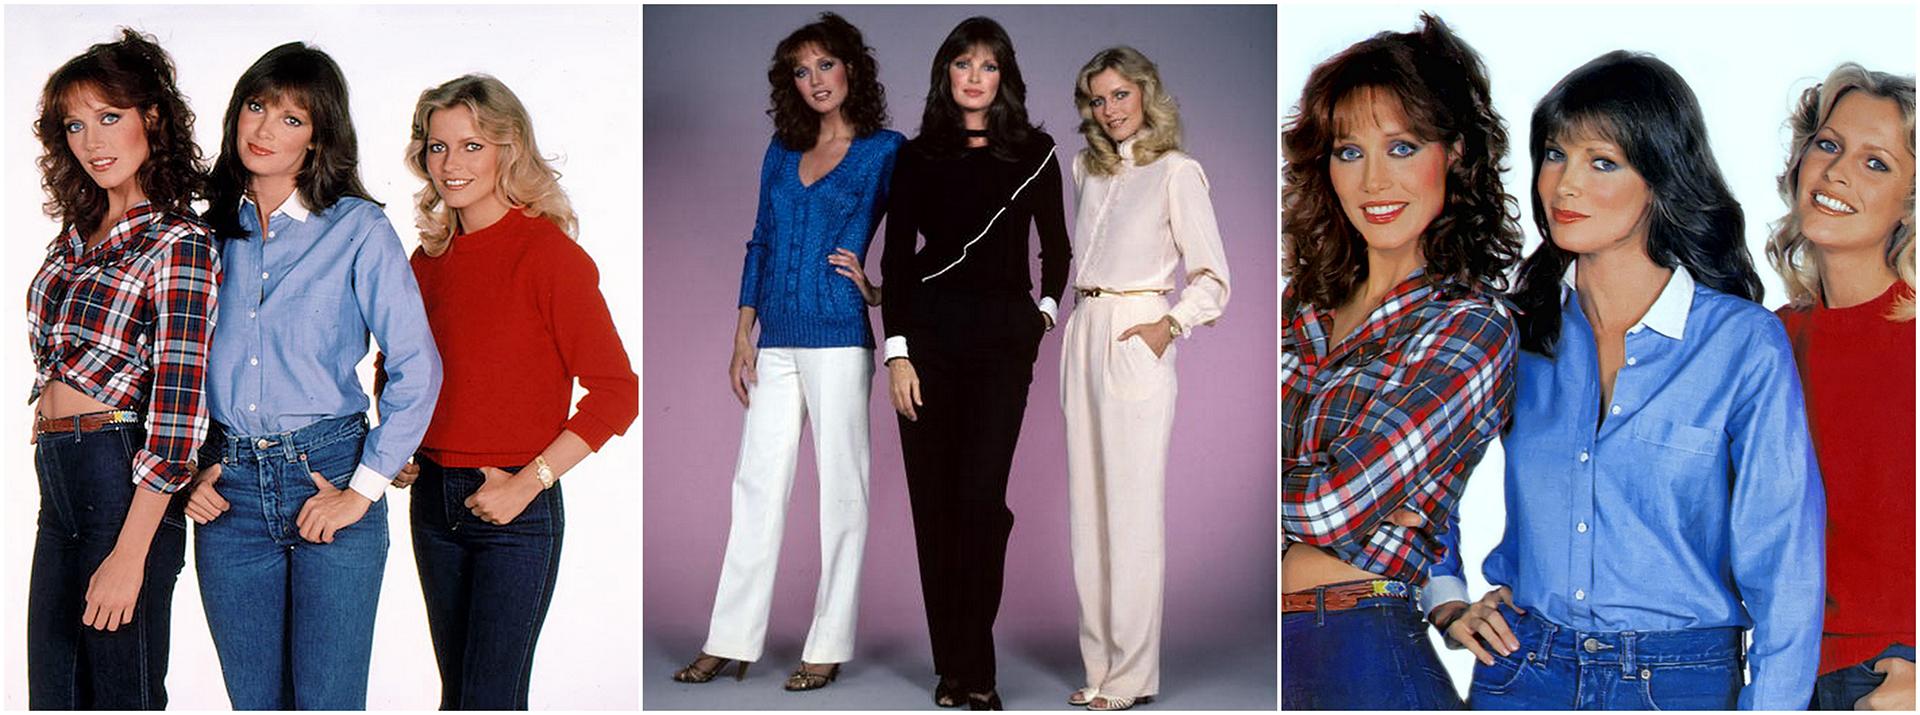 Charlie's Angels - Season 5: Tanya Roberts, Jaclyn Smith Cheryl Ladd